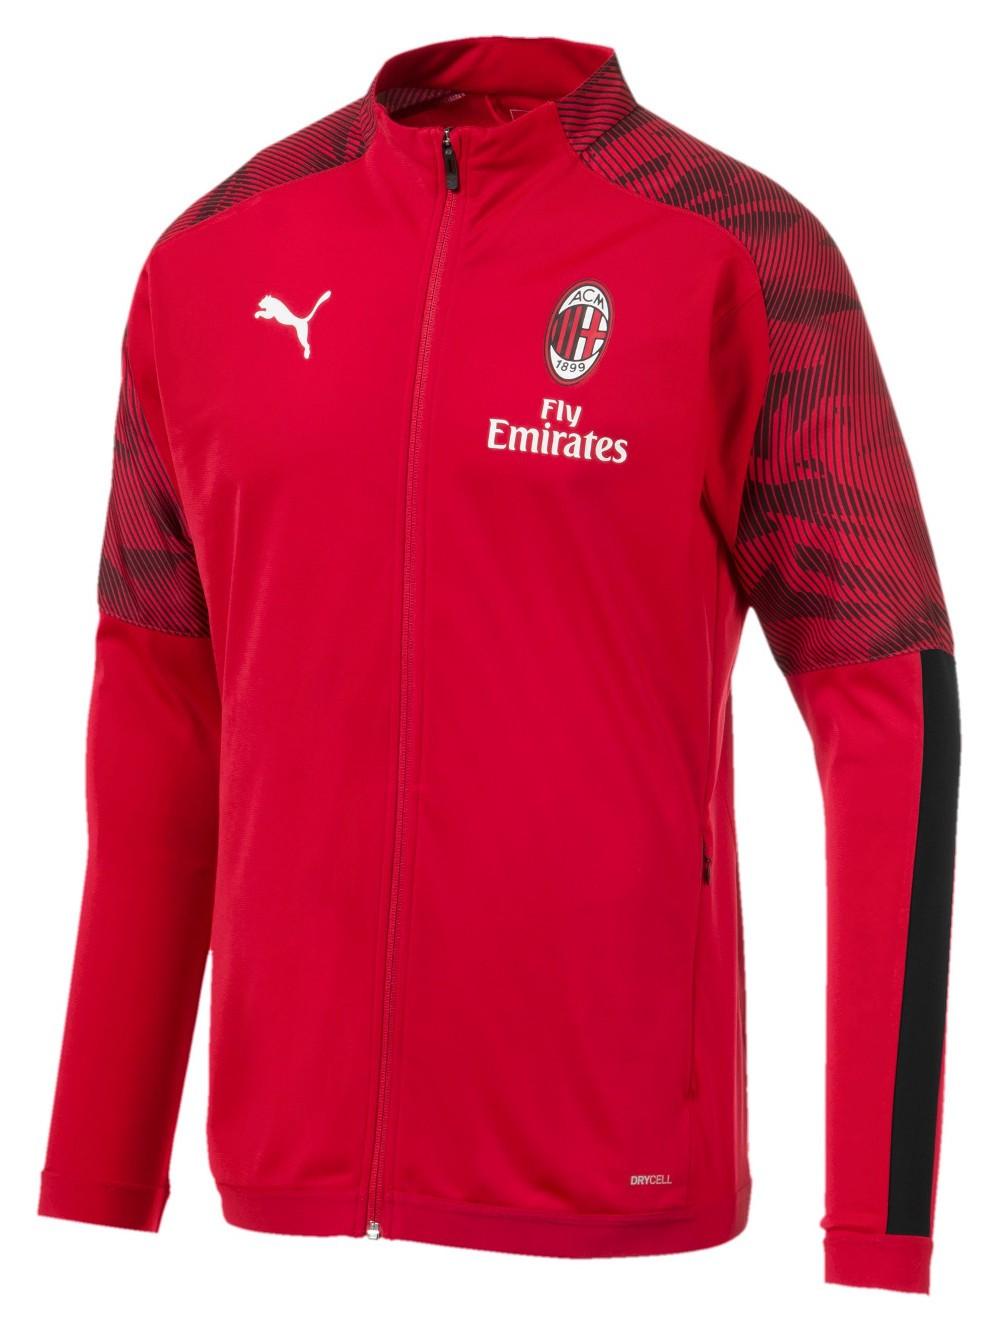 Ac Milan Puma Giacca Tuta Jacket Rosso Versione panchina 2019 20 0